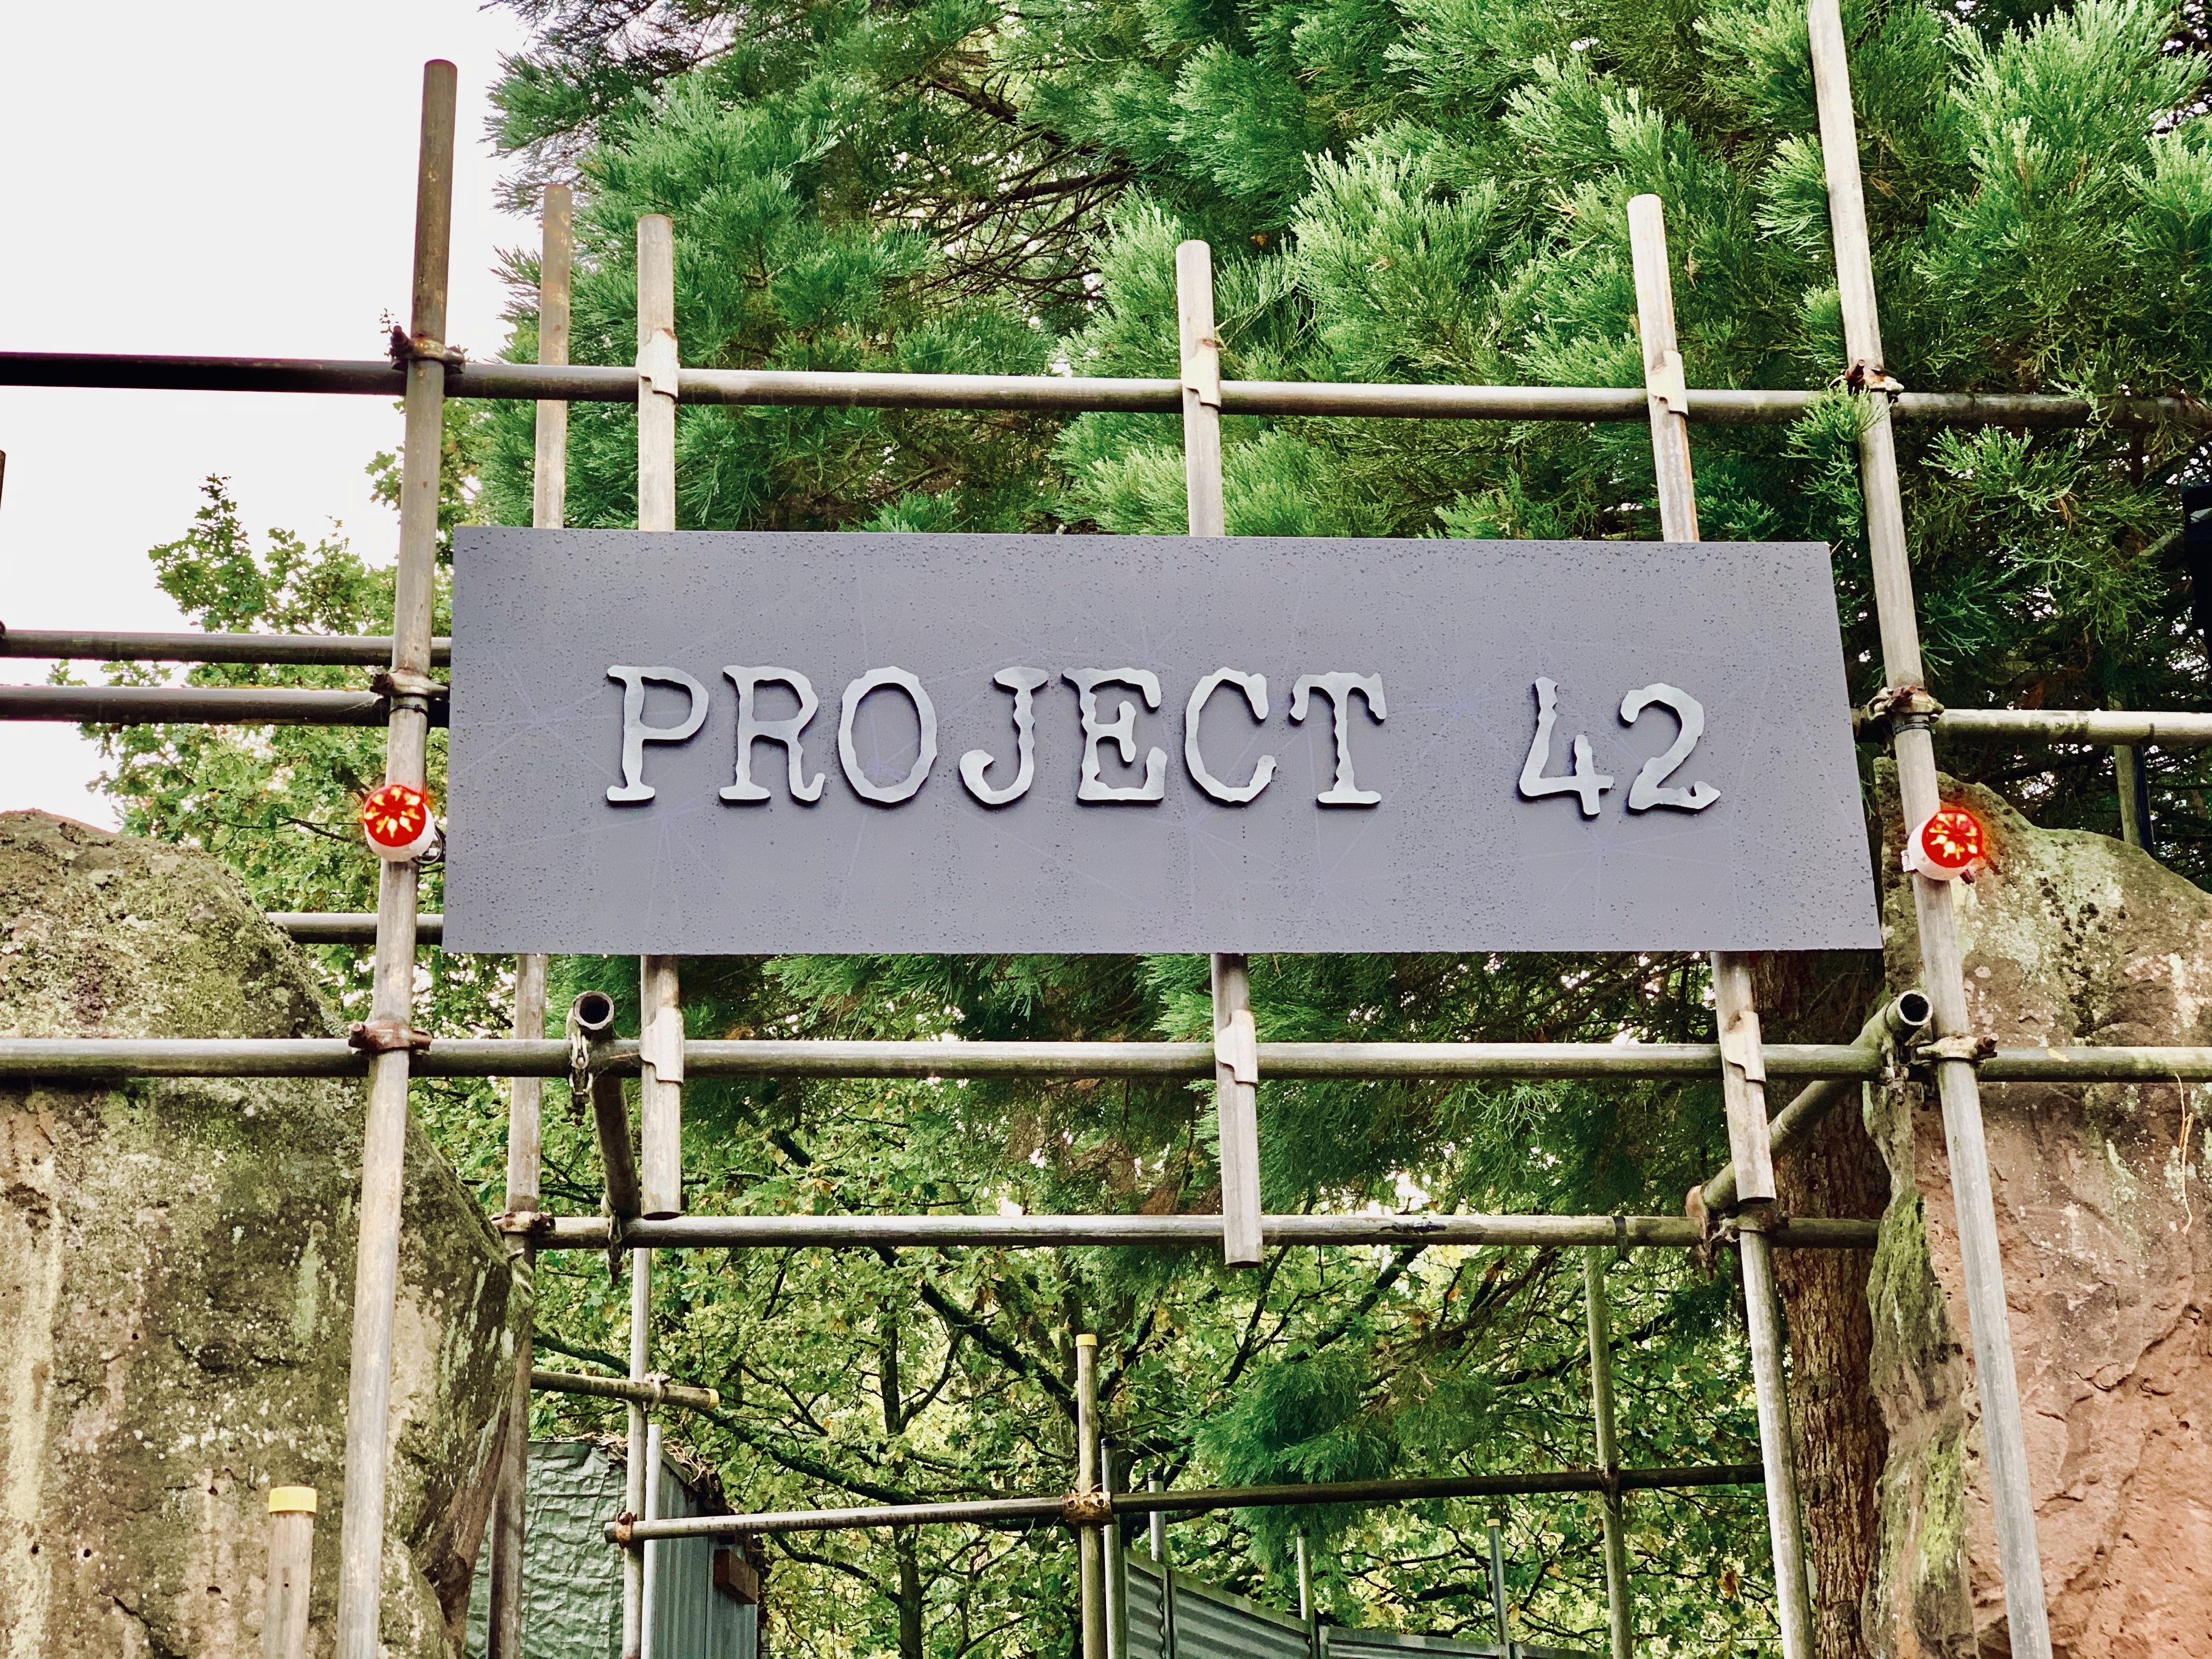 project 42 scare maze